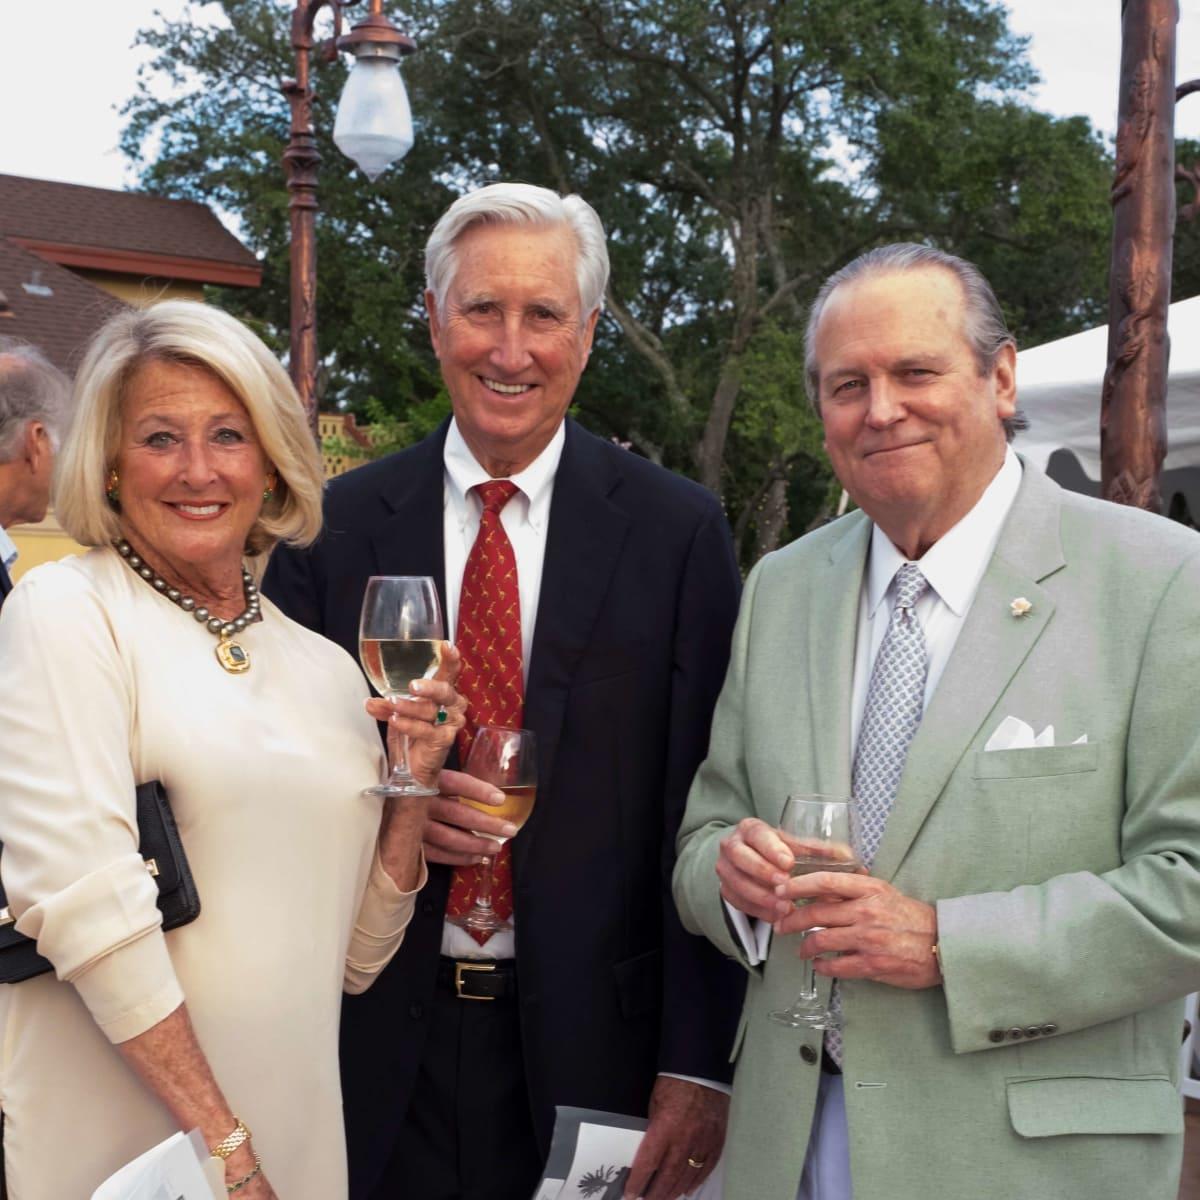 The Bryan Museum dinner, 9/16, Charlotte Crawford, Gail Crawford, Pat Oxford